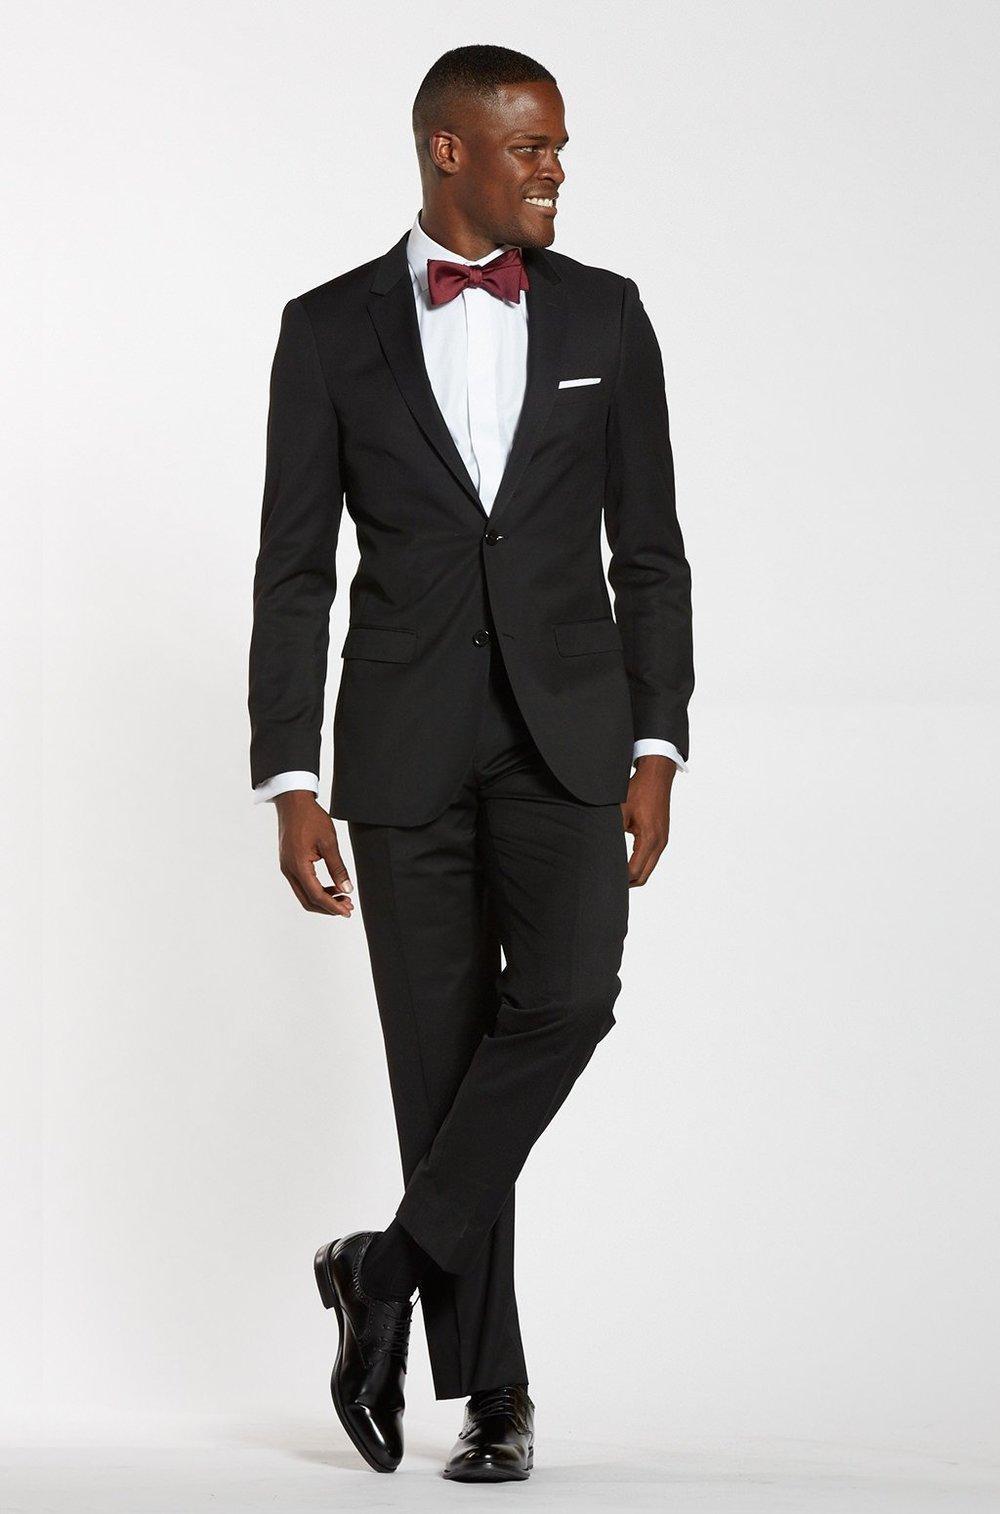 Classic Black Jacket, $119,  The Groomsman Suit